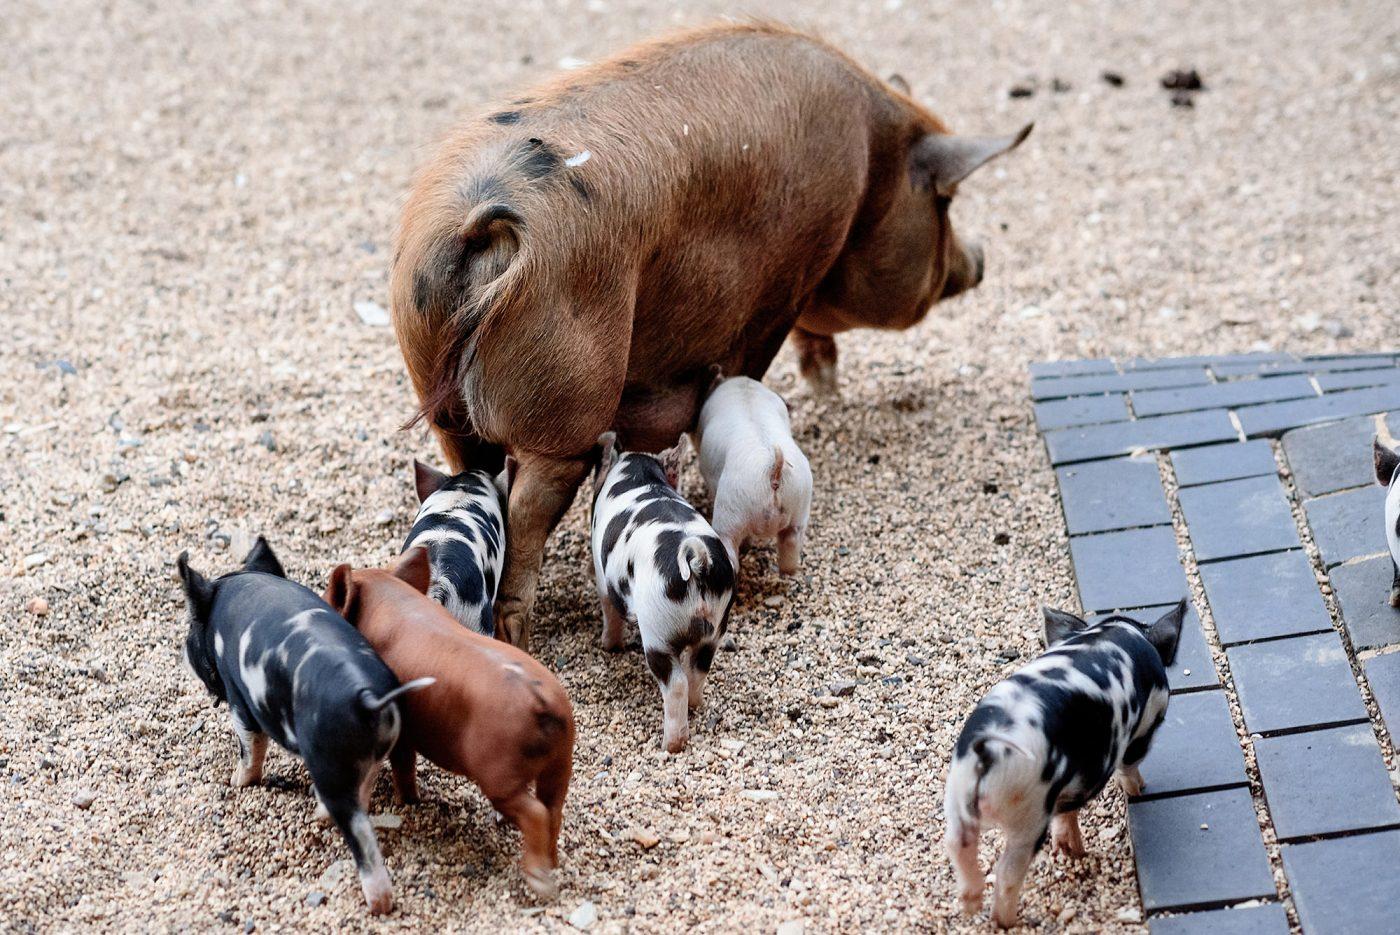 piglets at south farm